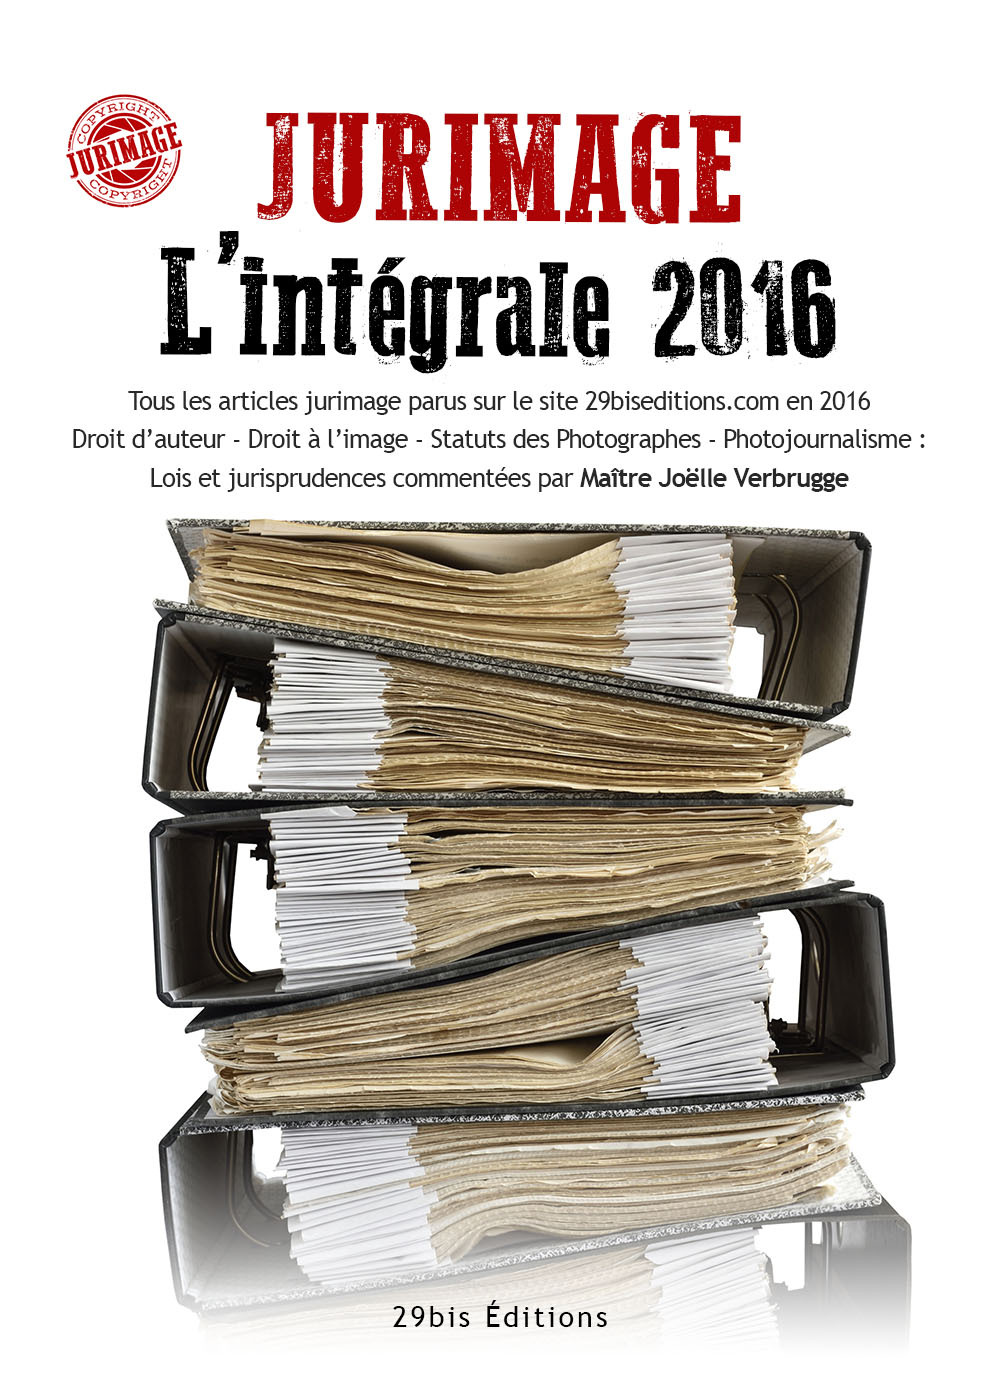 JURIMAGE L'INTEGRALE 2016